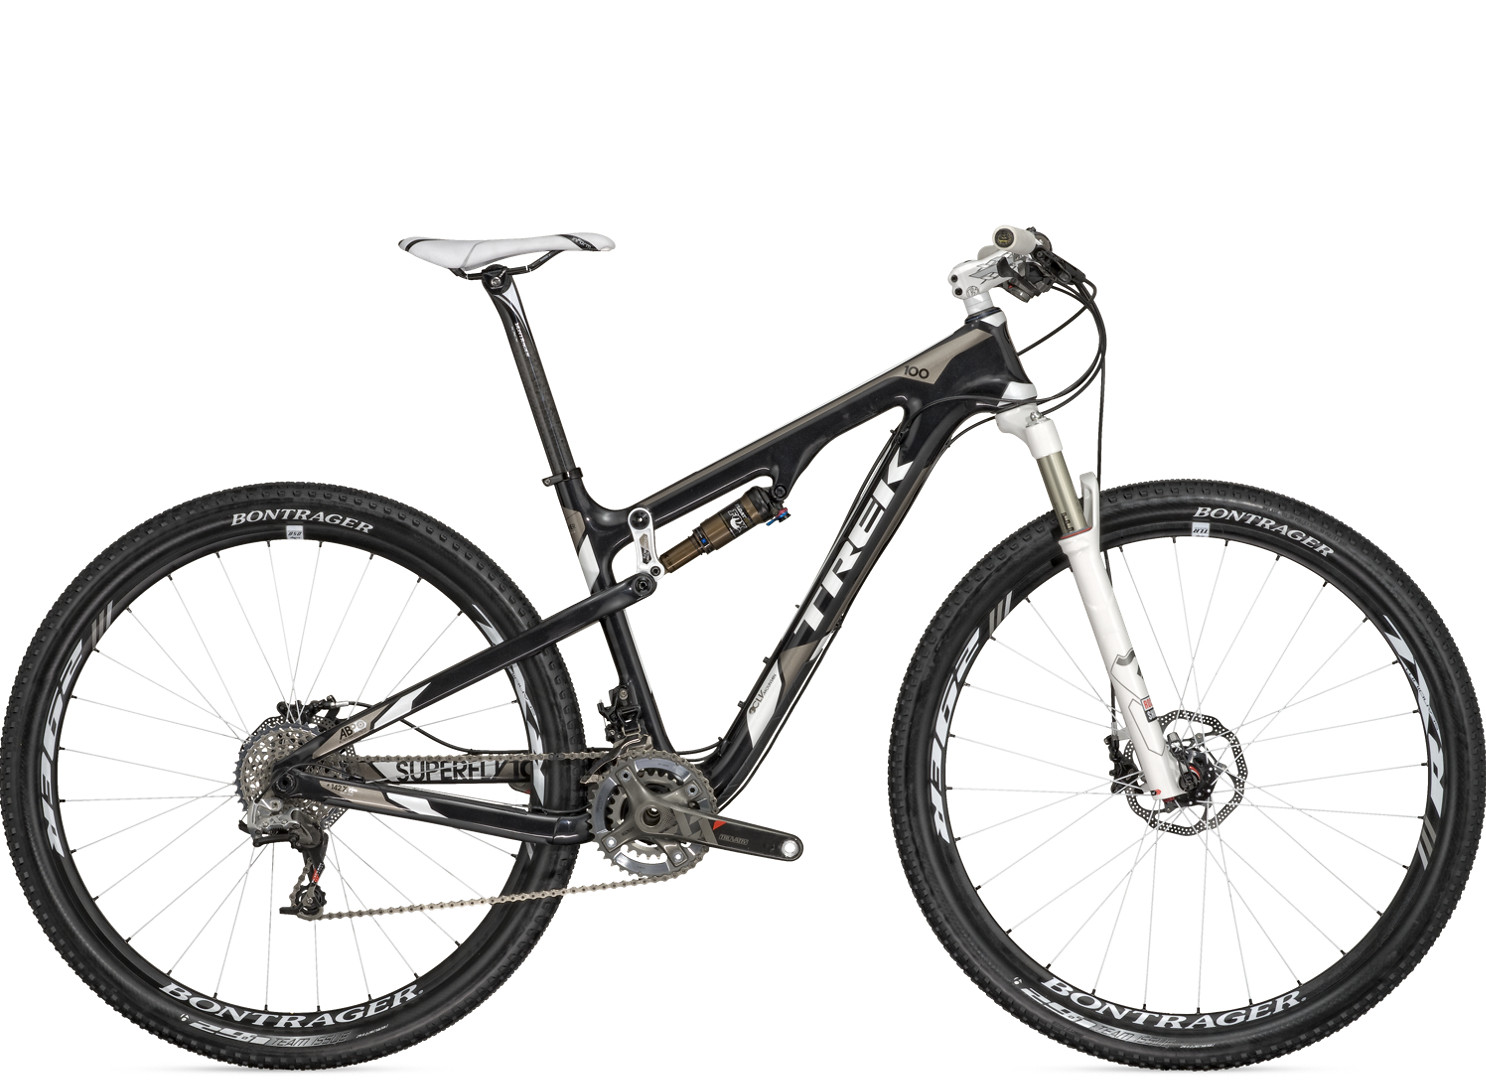 2012 Trek Superfly 100 Pro Bike 26924